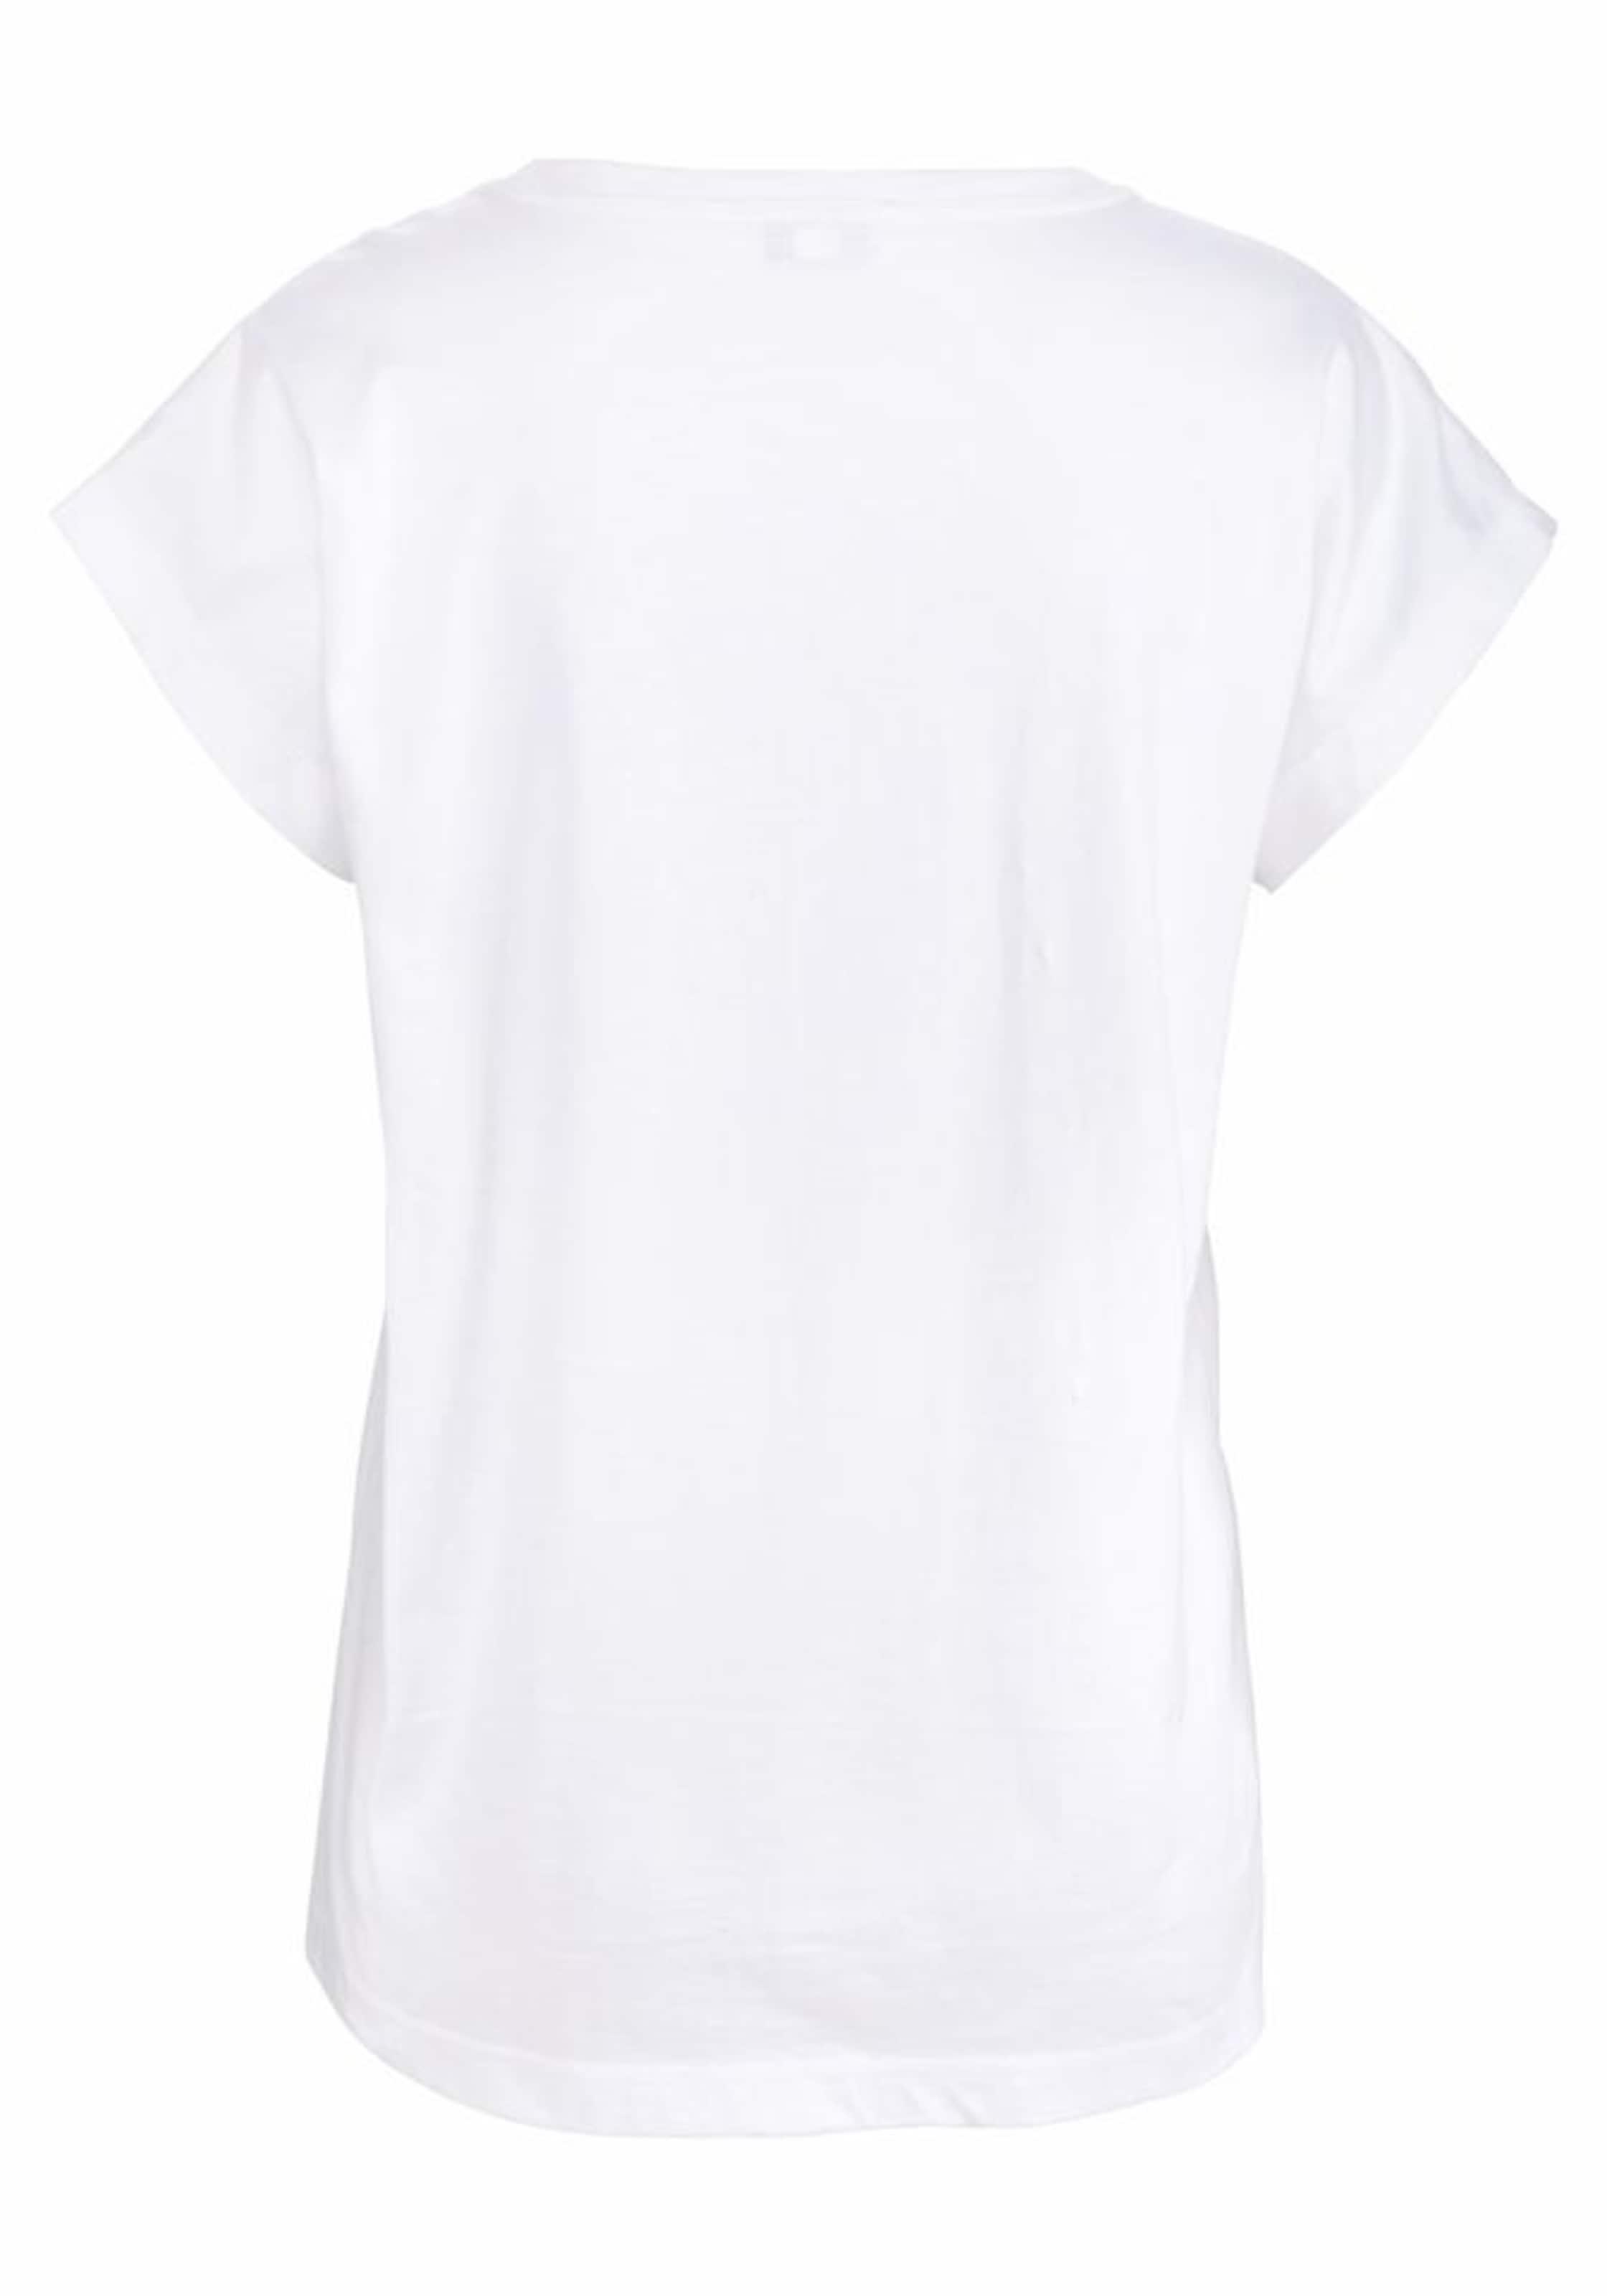 Weiß Dreams T In shirt Vivance PukXZi